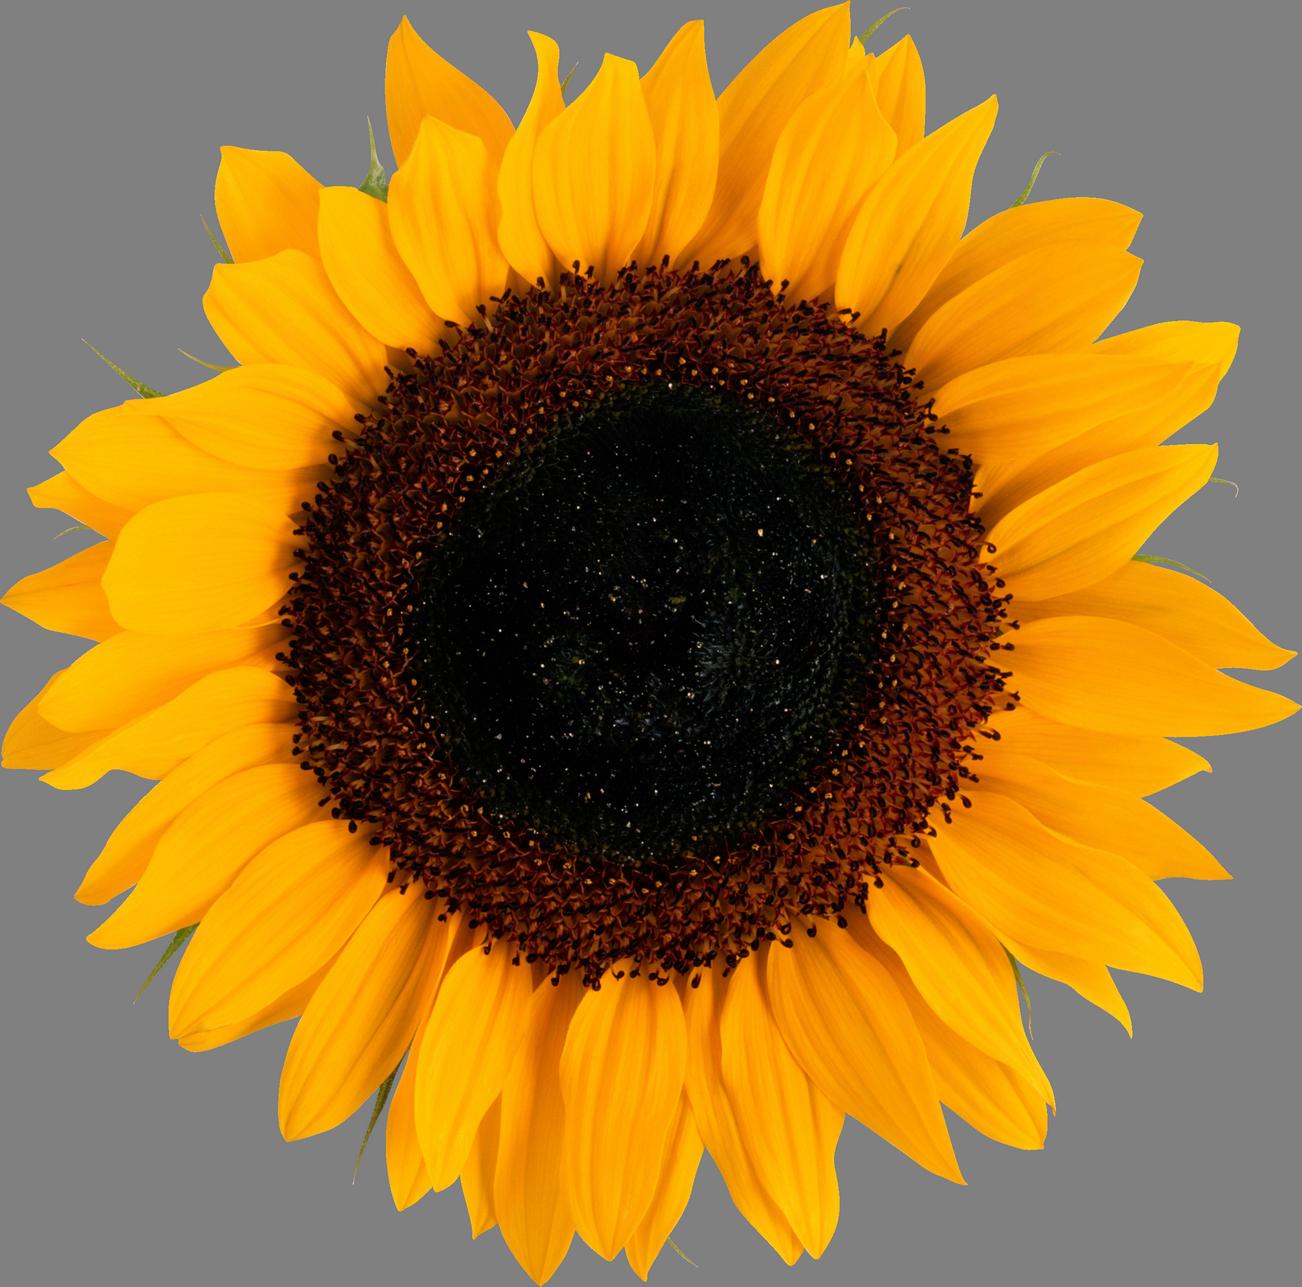 Sunflower image purepng free. Sun flower png